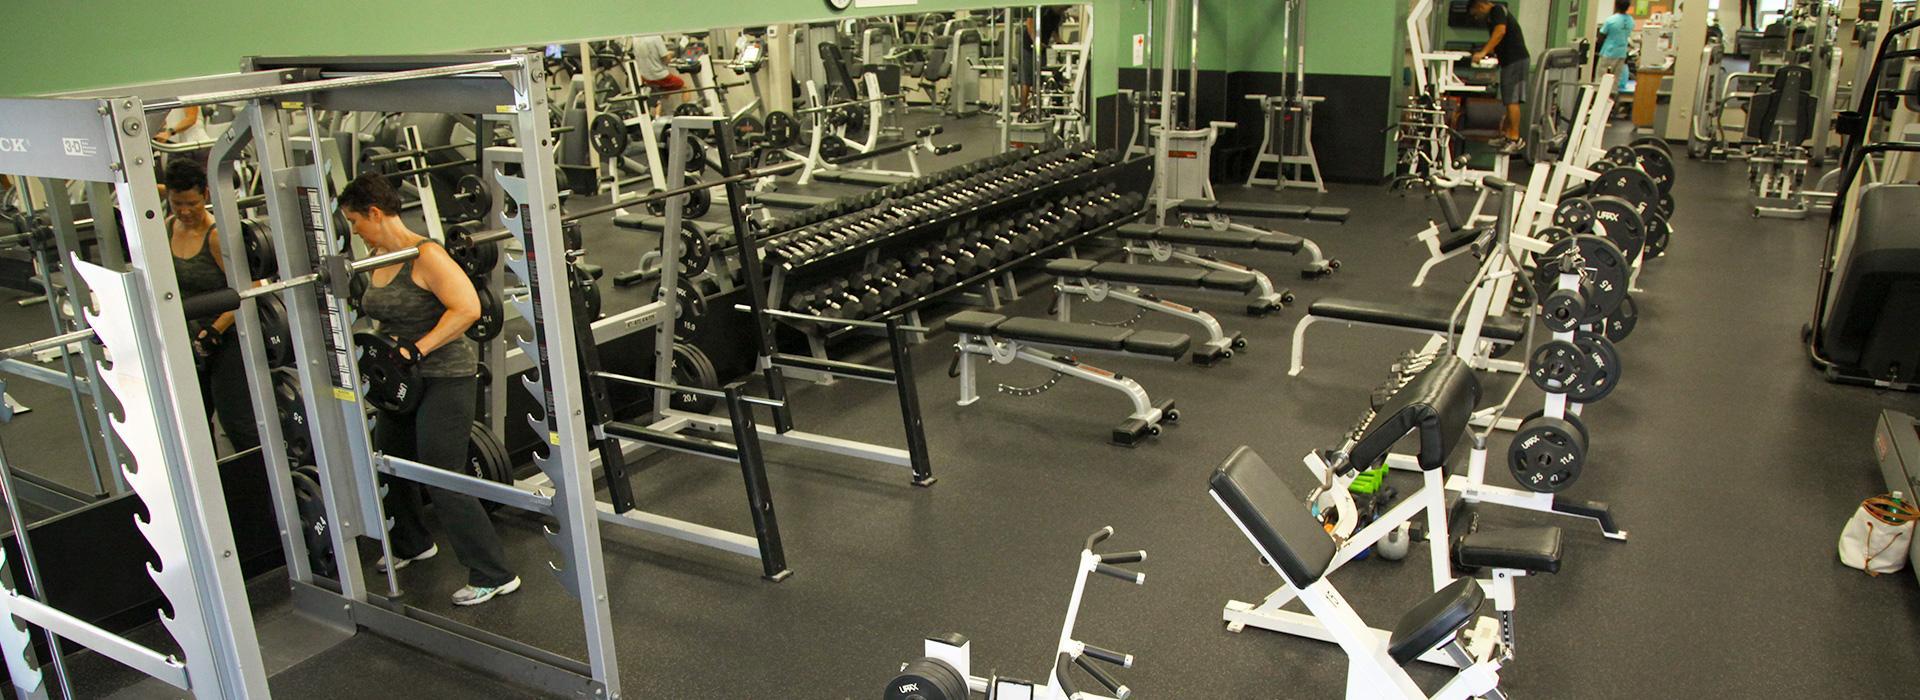 Hilltop Family YMCA | YMCA of South Hampton Roads